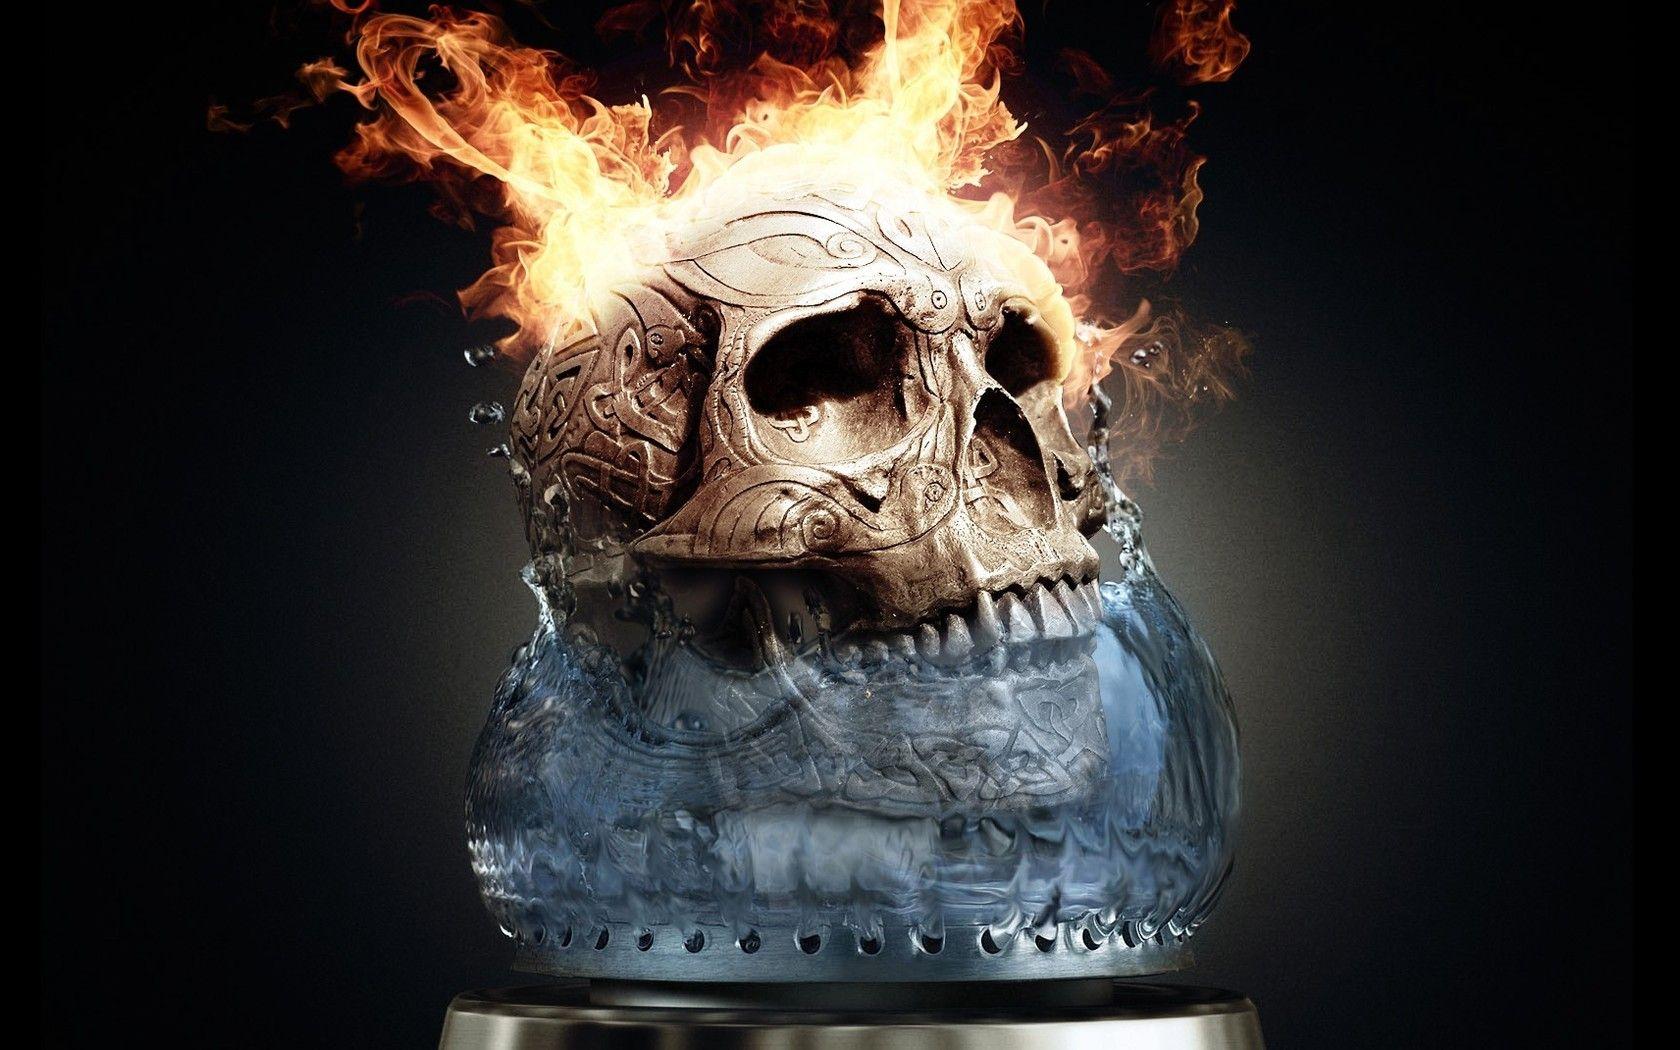 dark - skull - fire - flames - dark - artistic wallpaper | cool